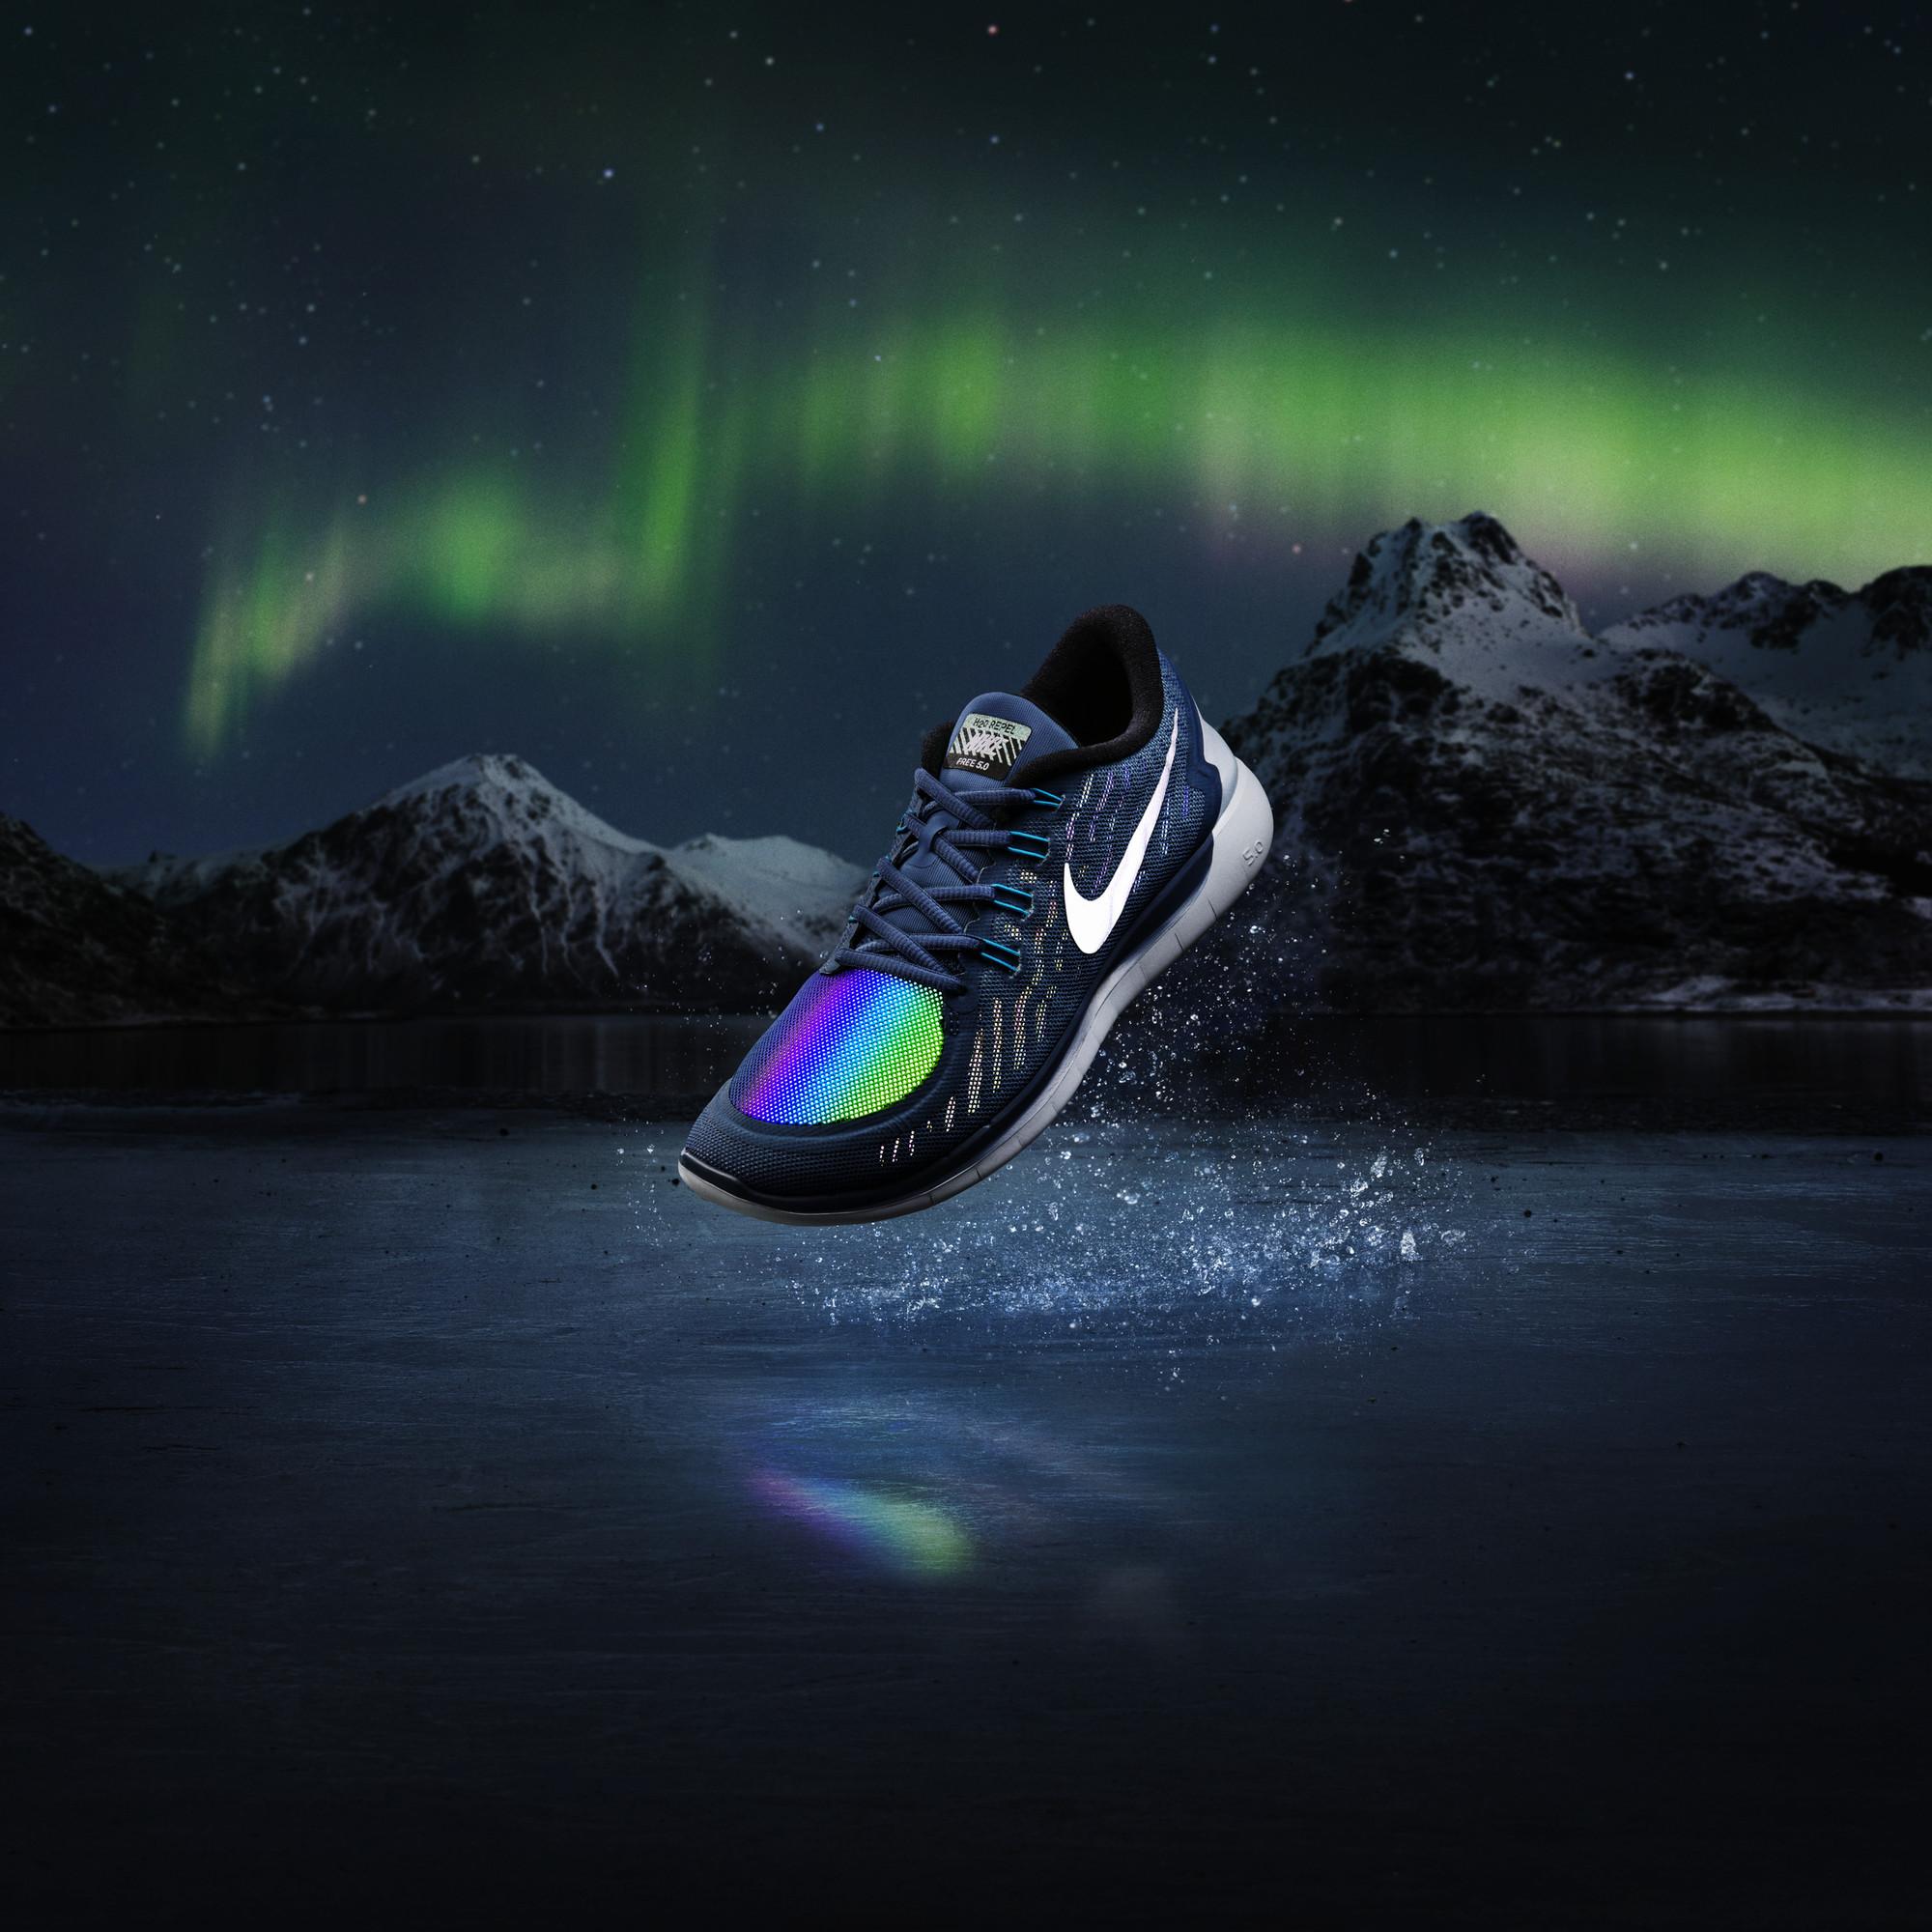 Nike_Free_5_0_Flash_mens_original (1)